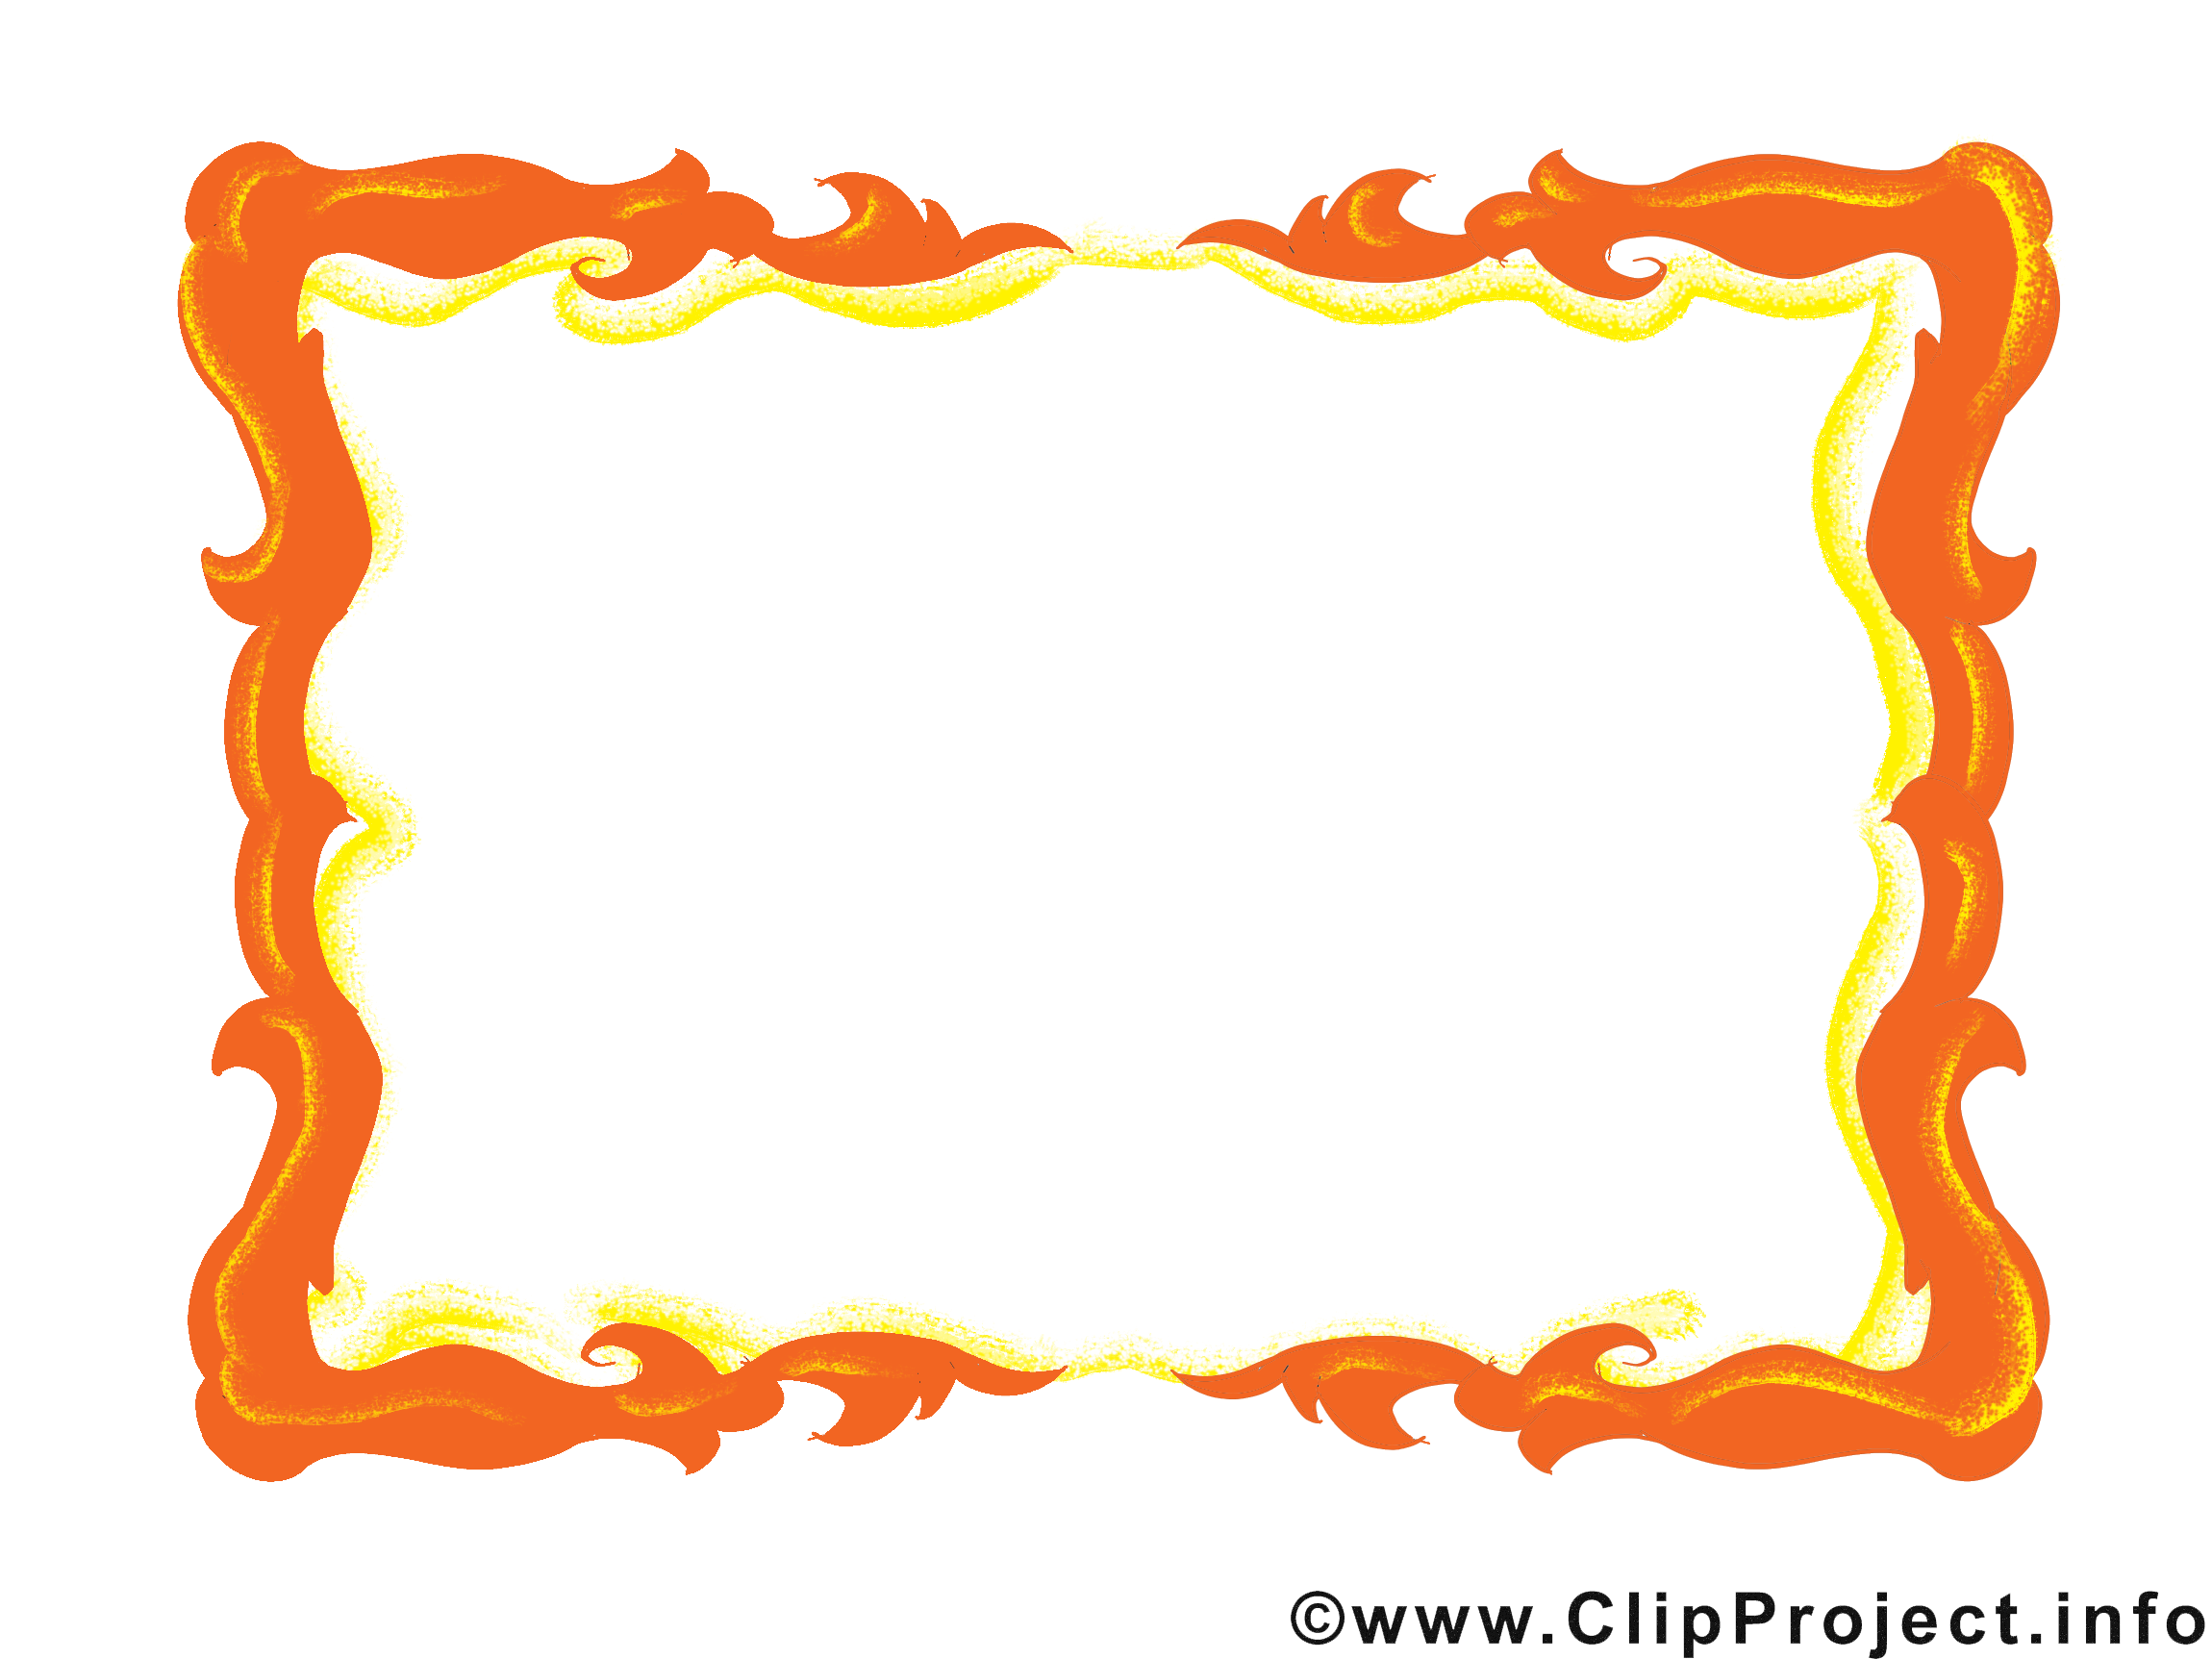 Einladung geburtstag clipart image transparent Umrandung Clipart, Bild, Rahmenbild, Grafik kostenlos image transparent